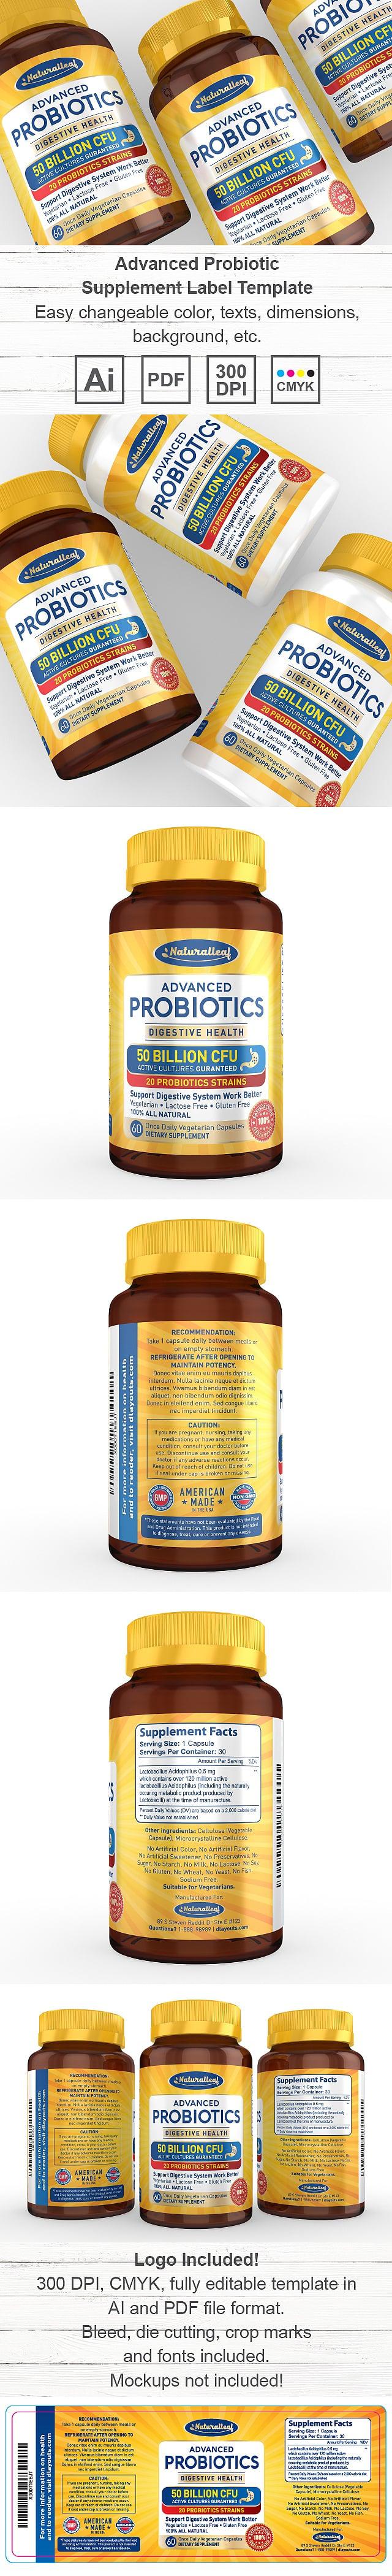 Advanced Probiotic Supplement Label Template